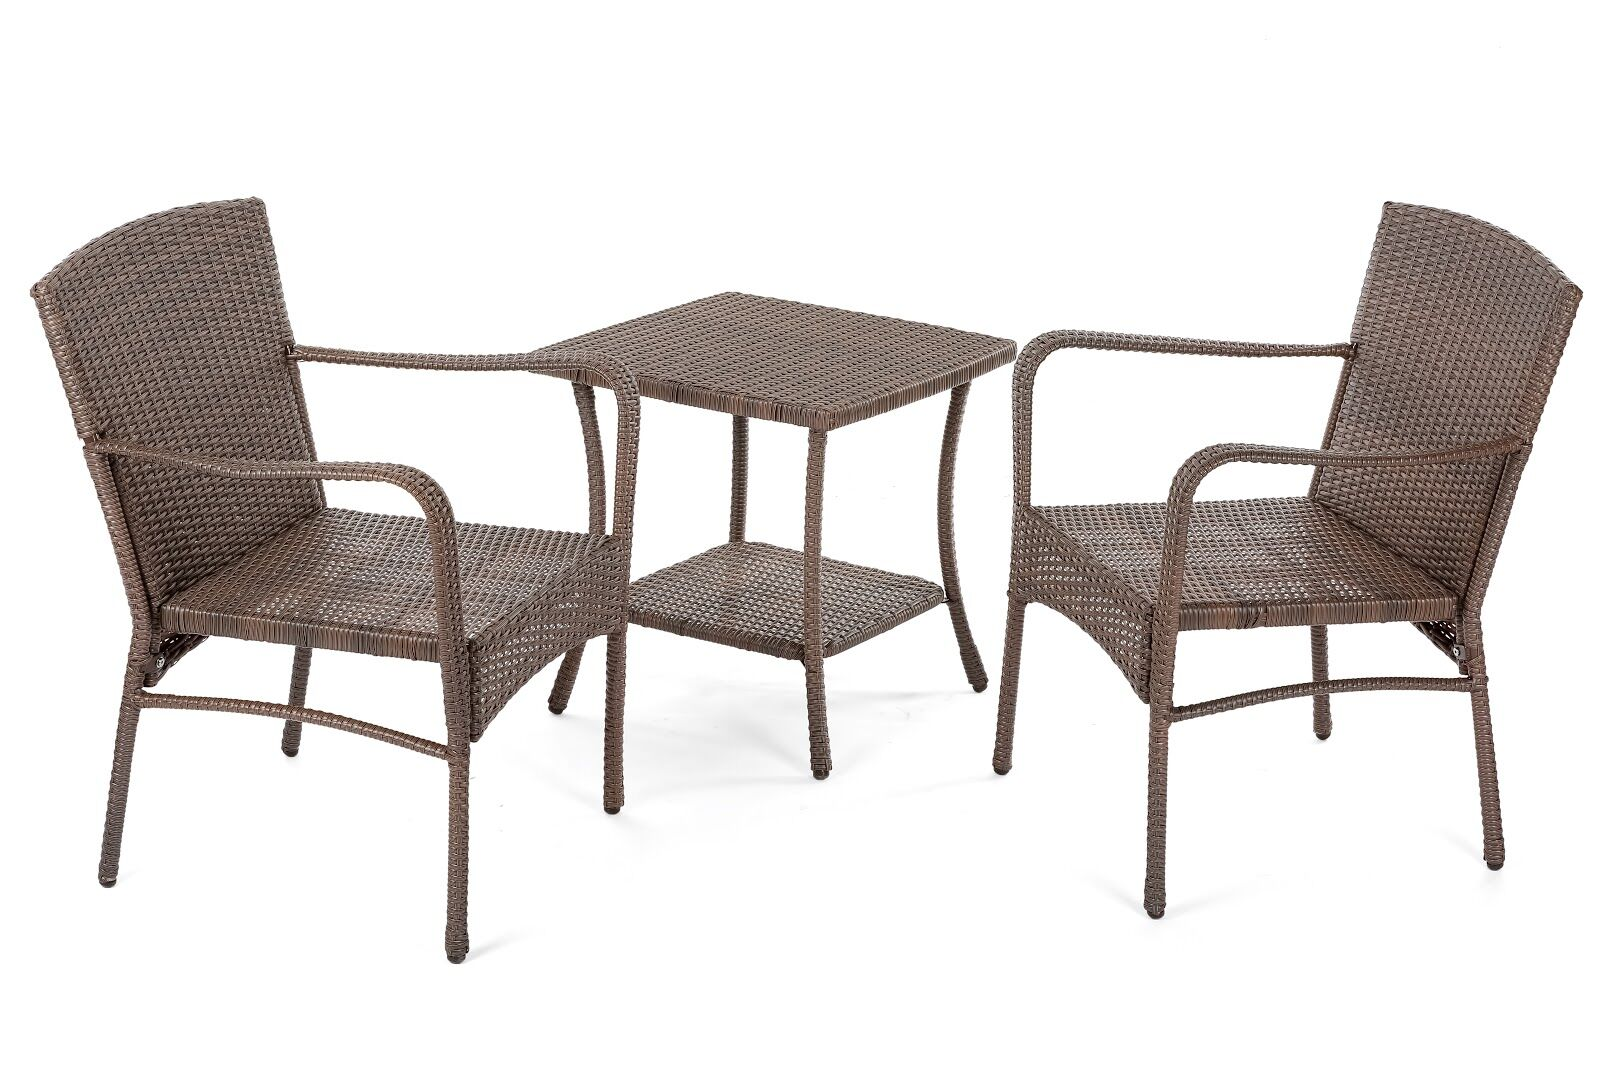 Warrick Outdoor Garden 3 Piece 2 Person Seating Group